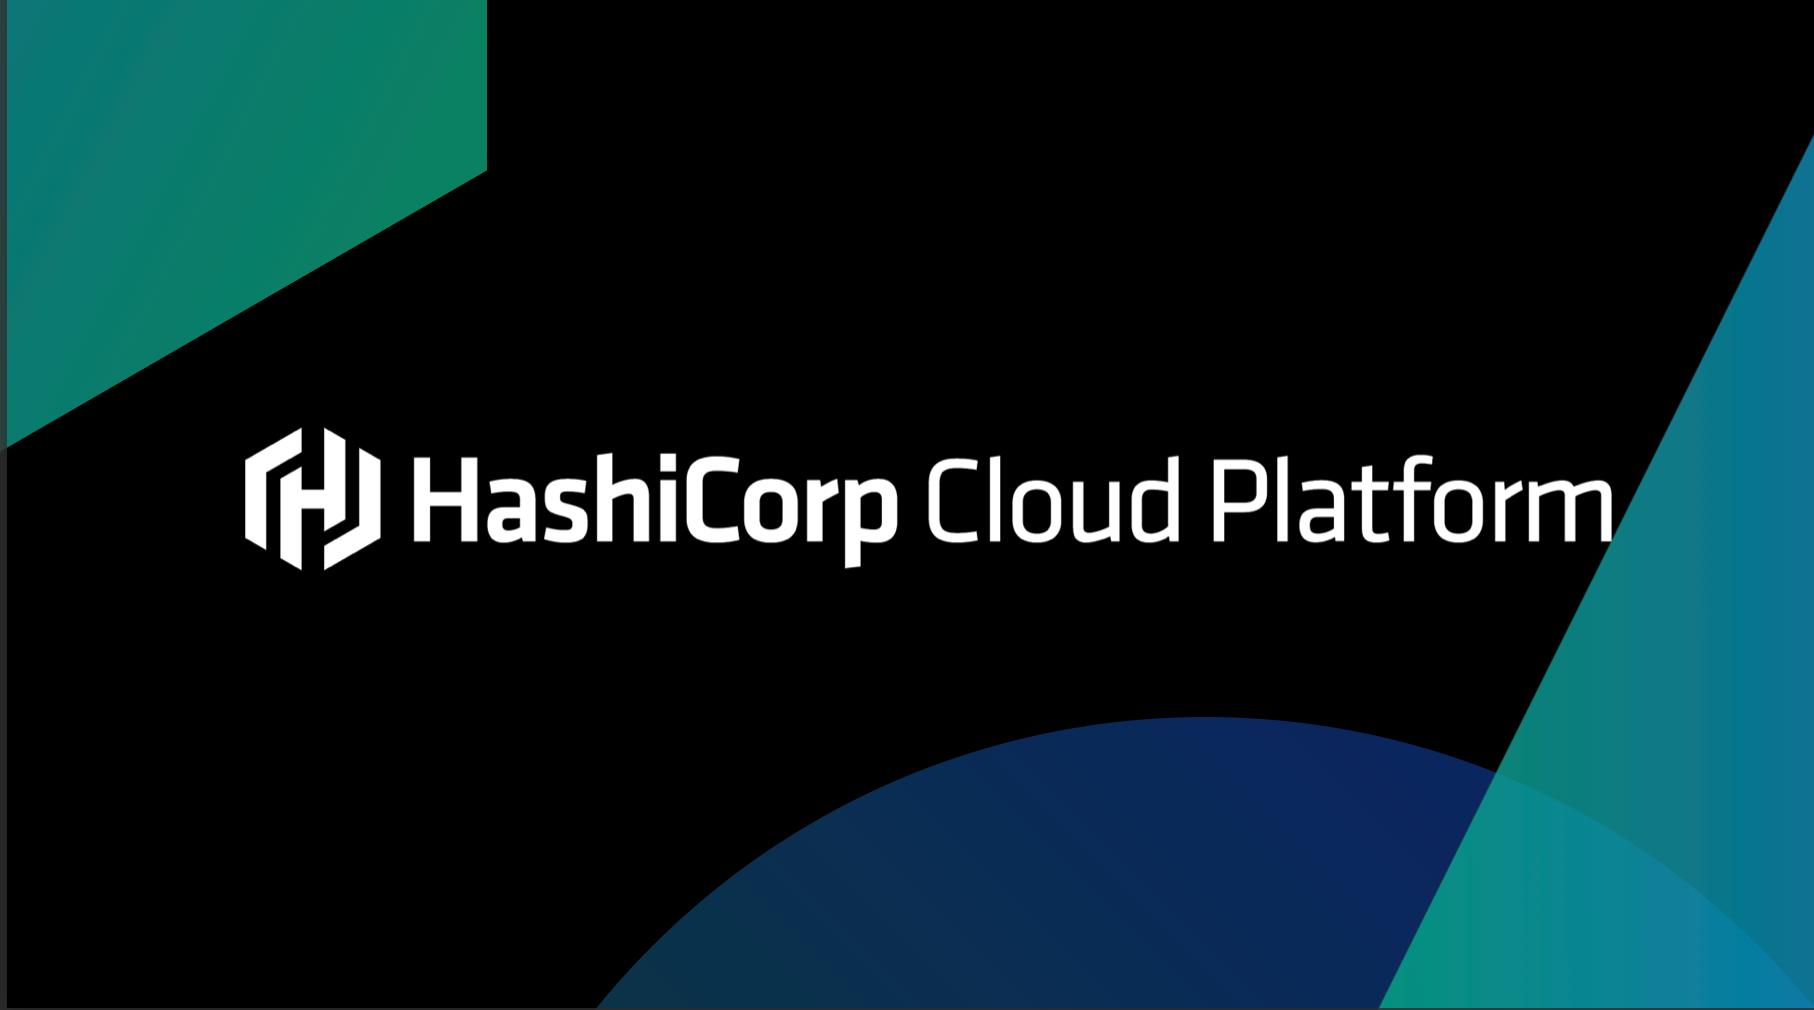 HashiConf Digital Keynote - HashiCorp Cloud Platform Announcement Image